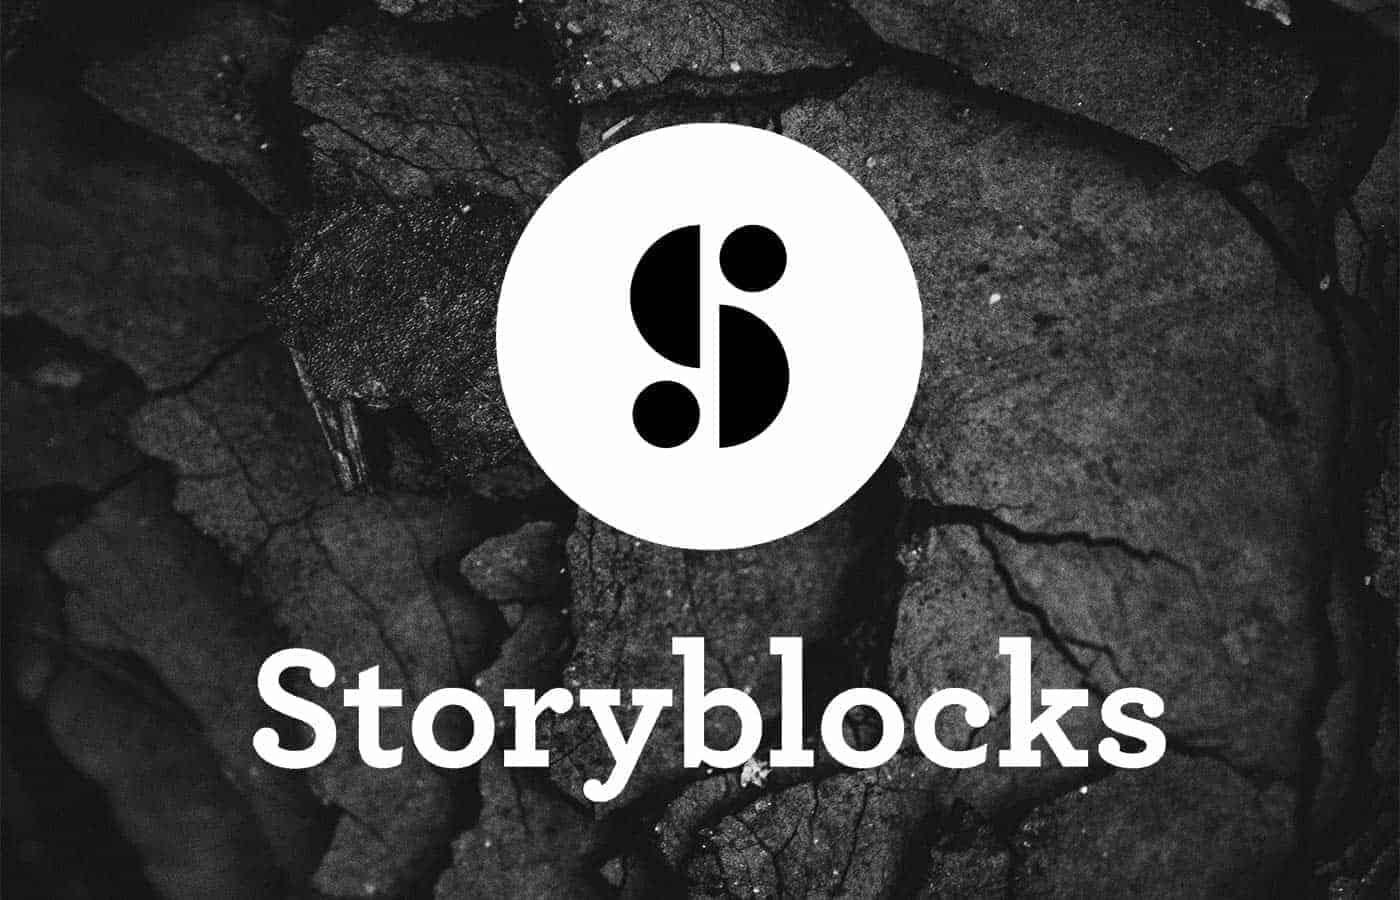 Storyblocks - the new Image Stock Photo Service by Videoblocks